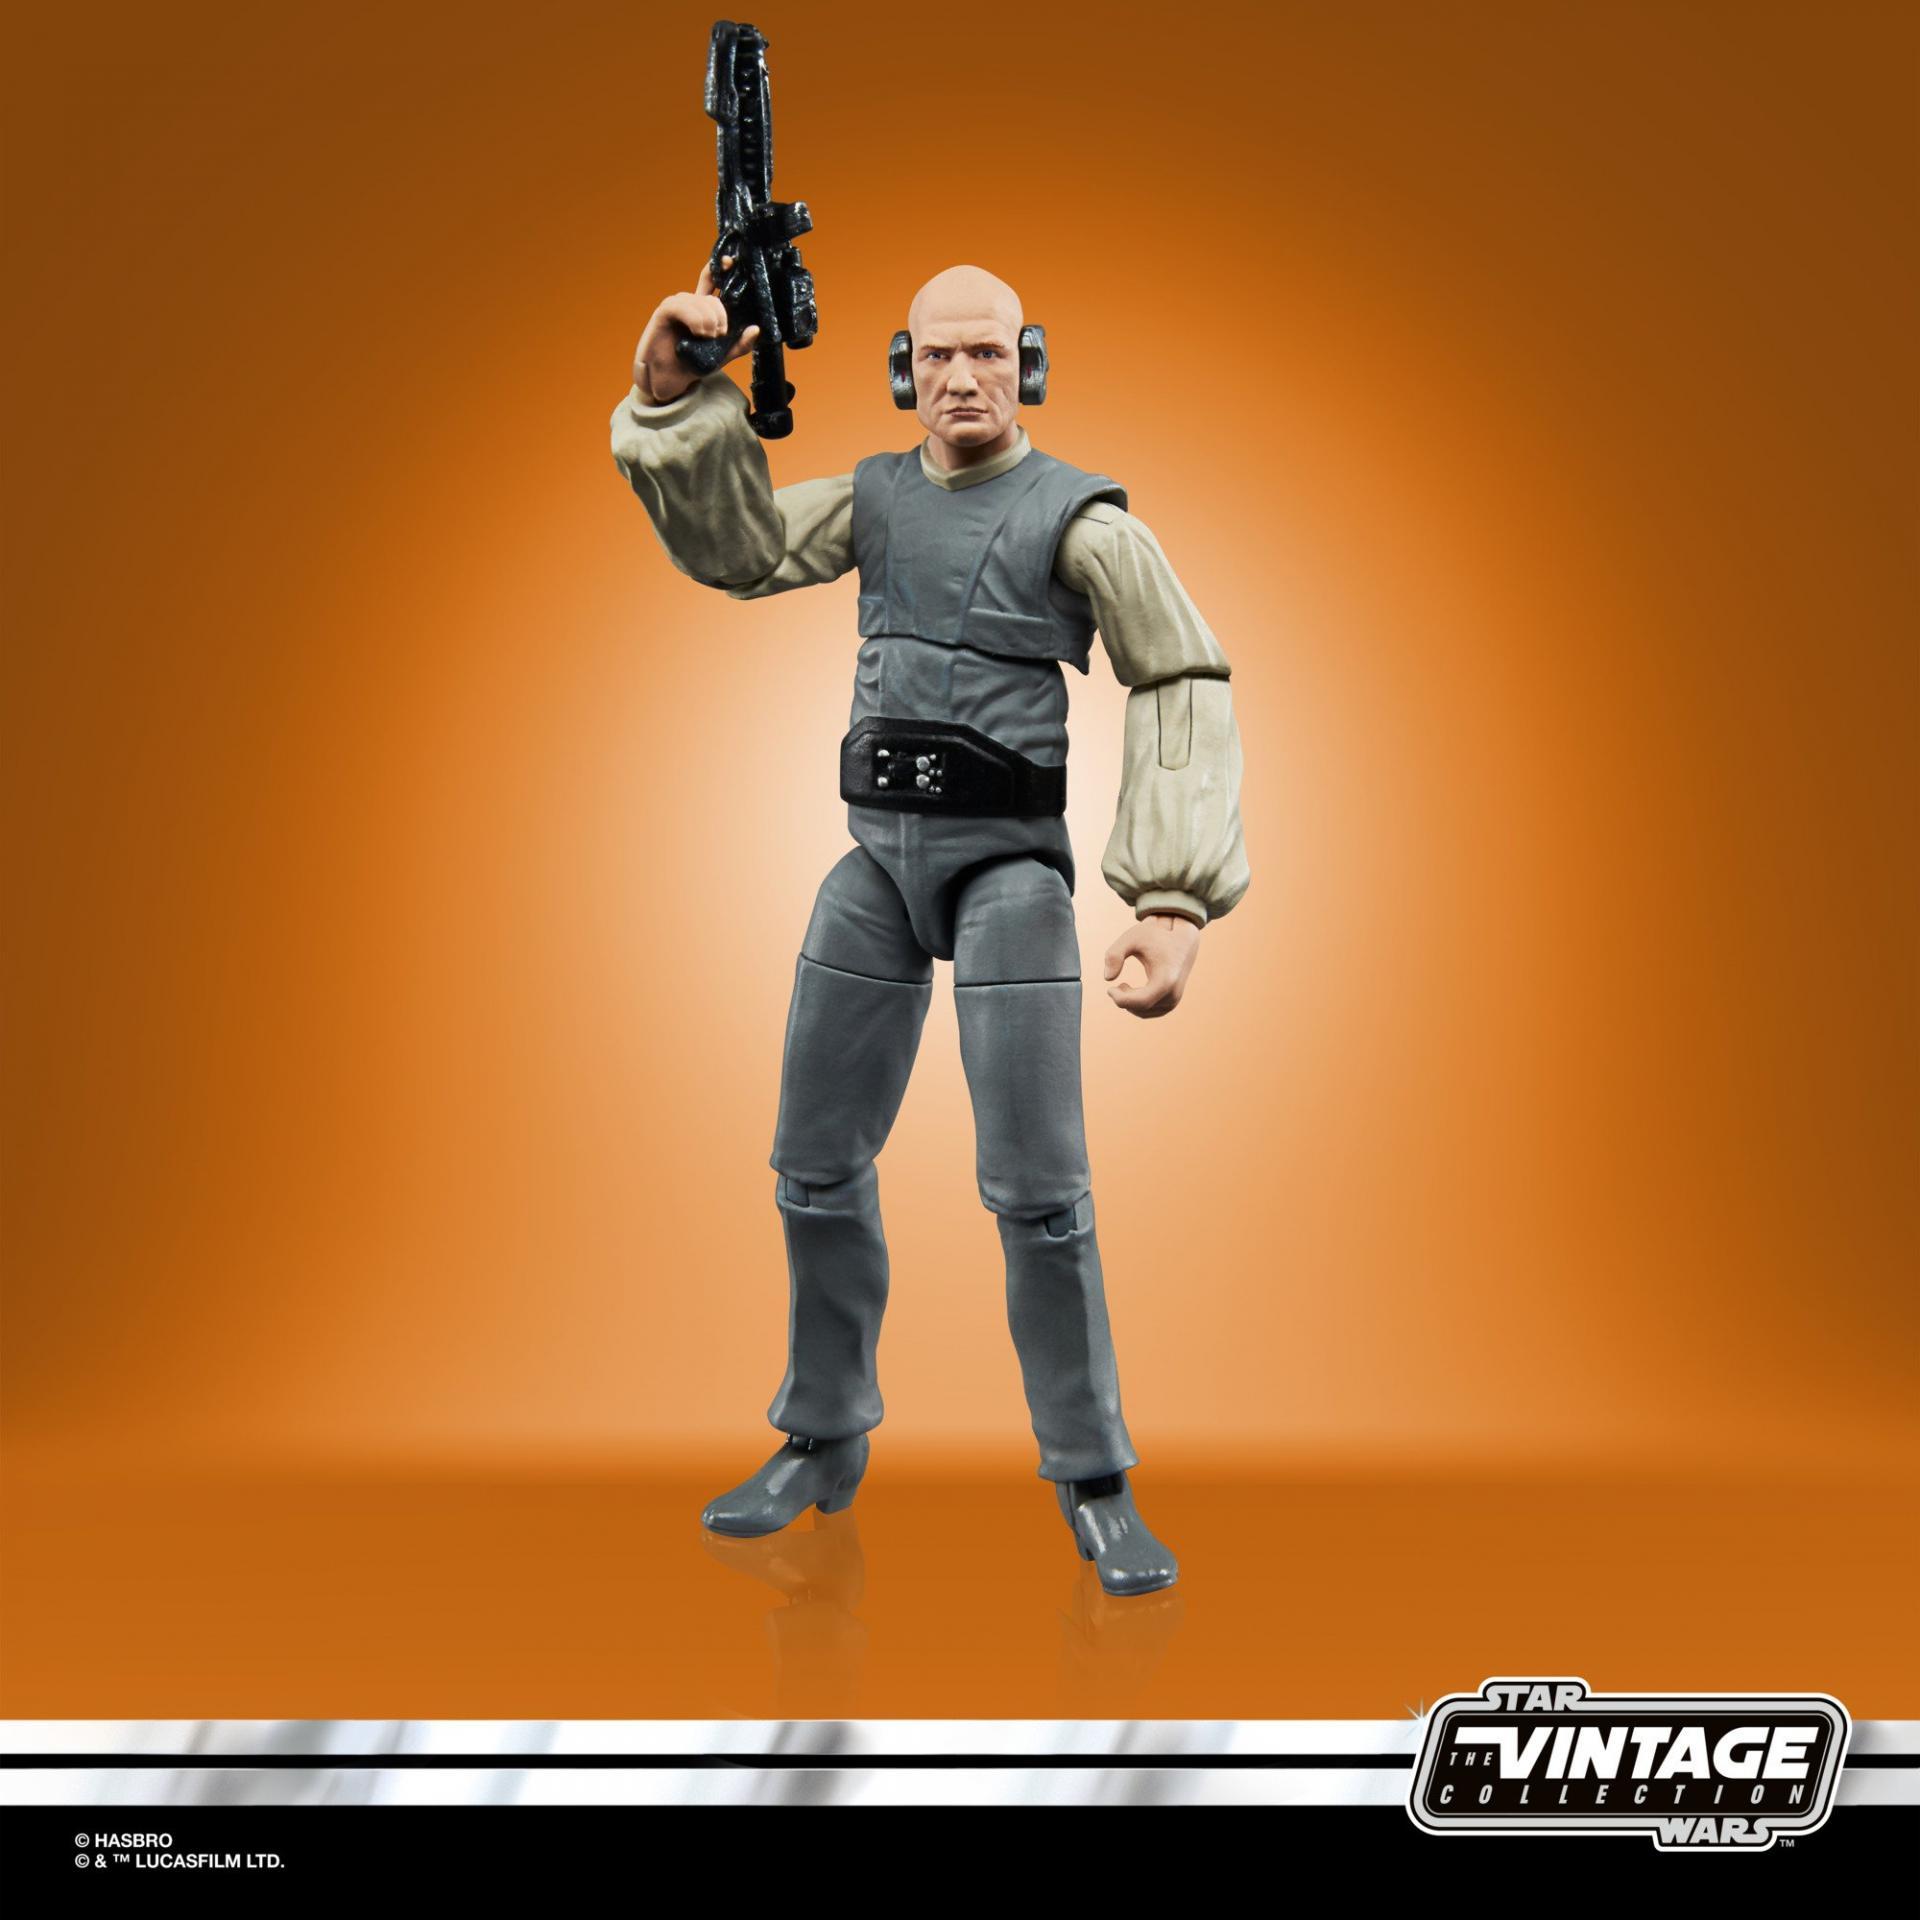 Star wars the vintage collection lobot5